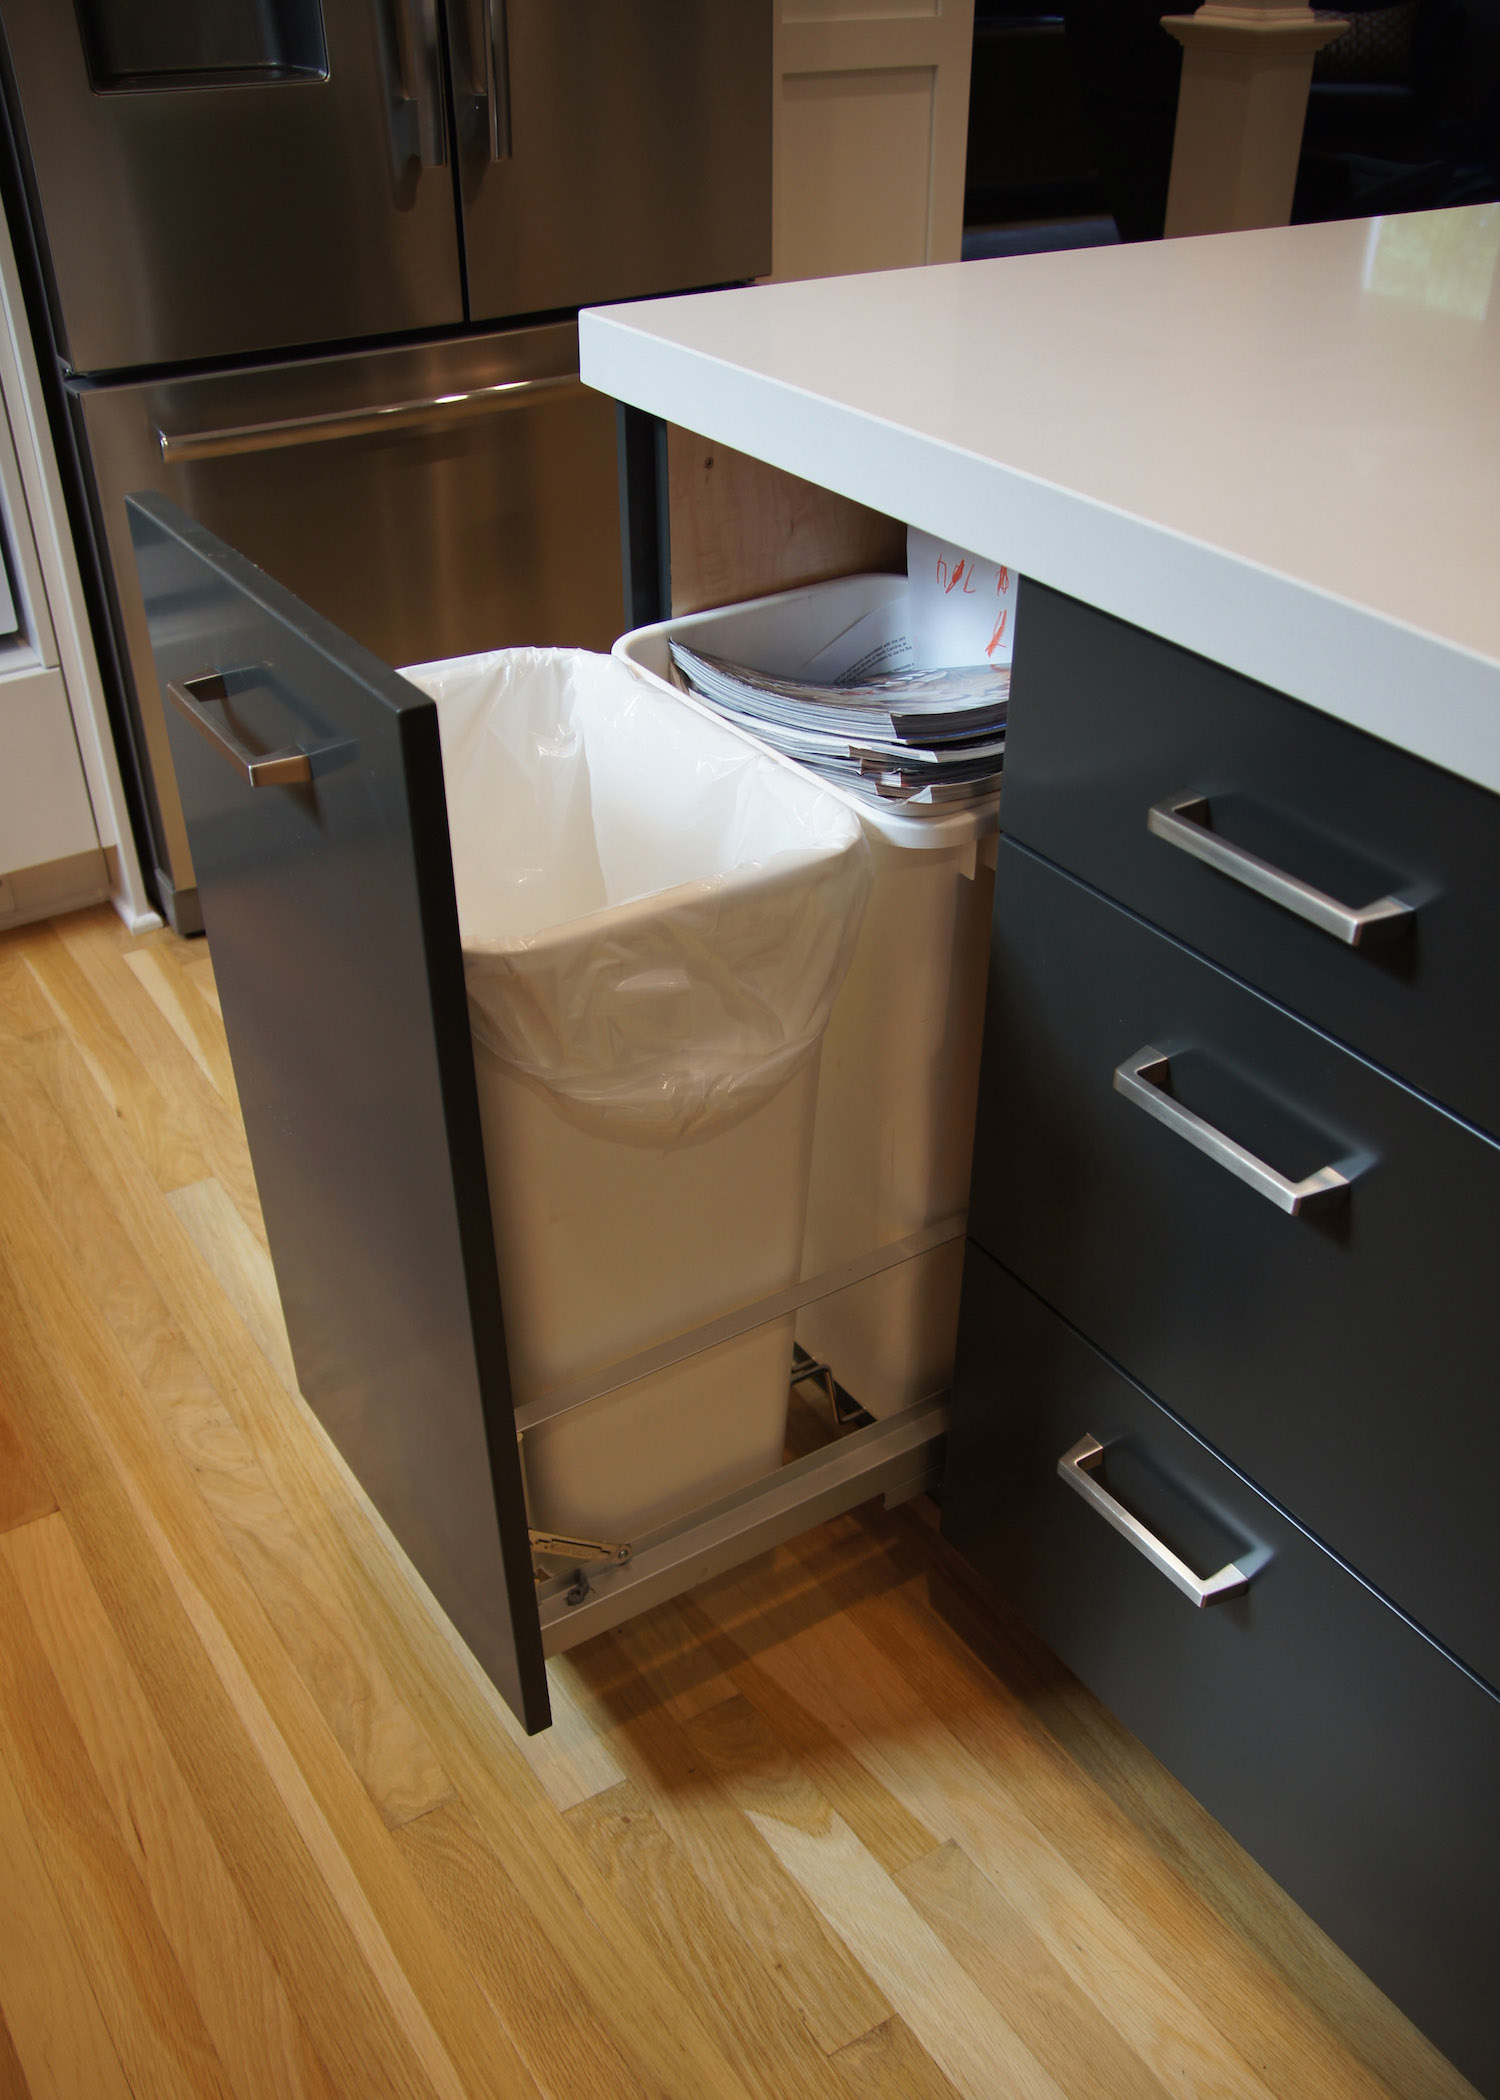 S.trash can.01.jpg